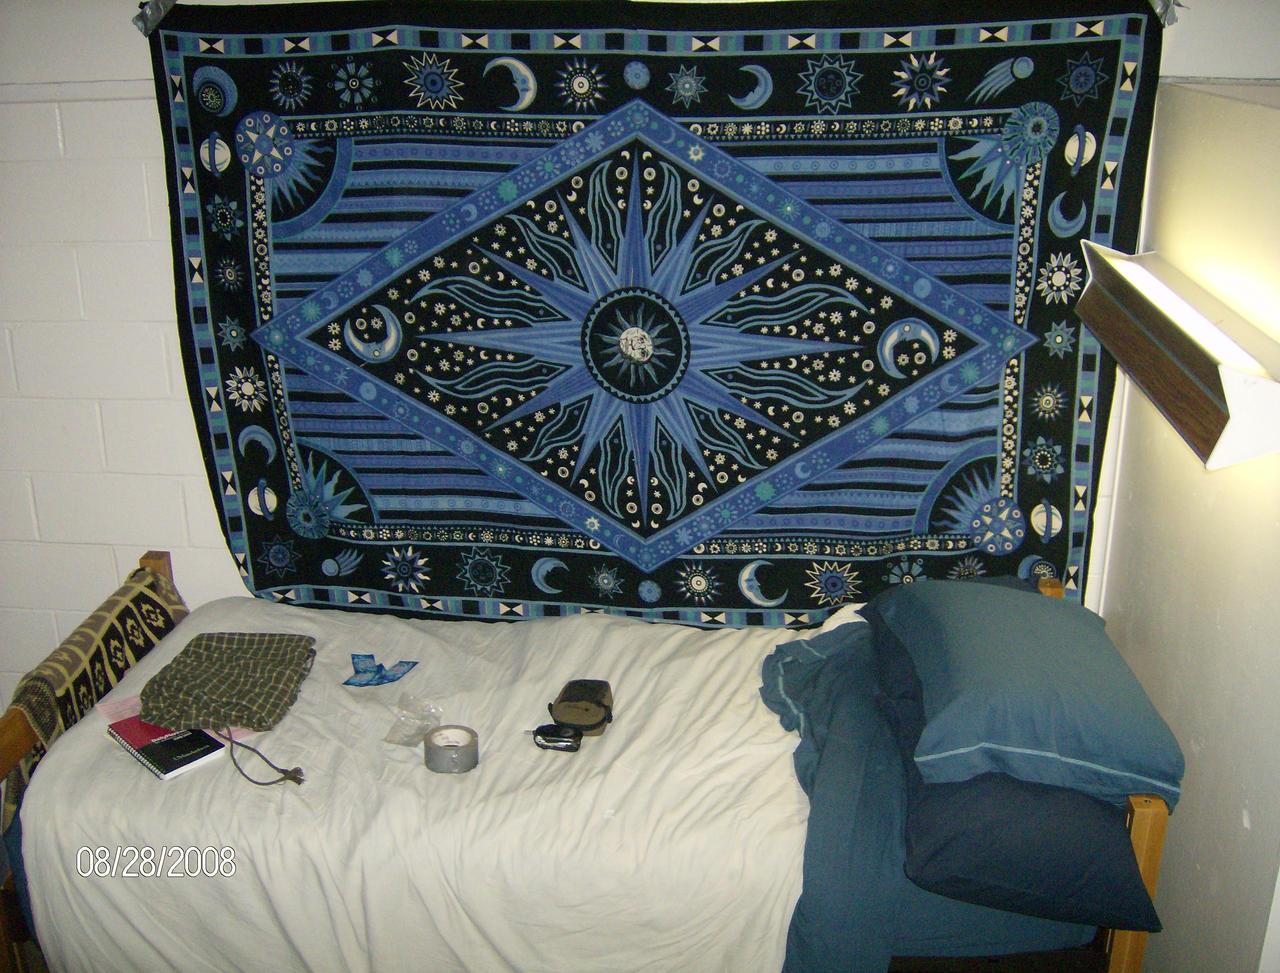 Dorm at Umass Amherst